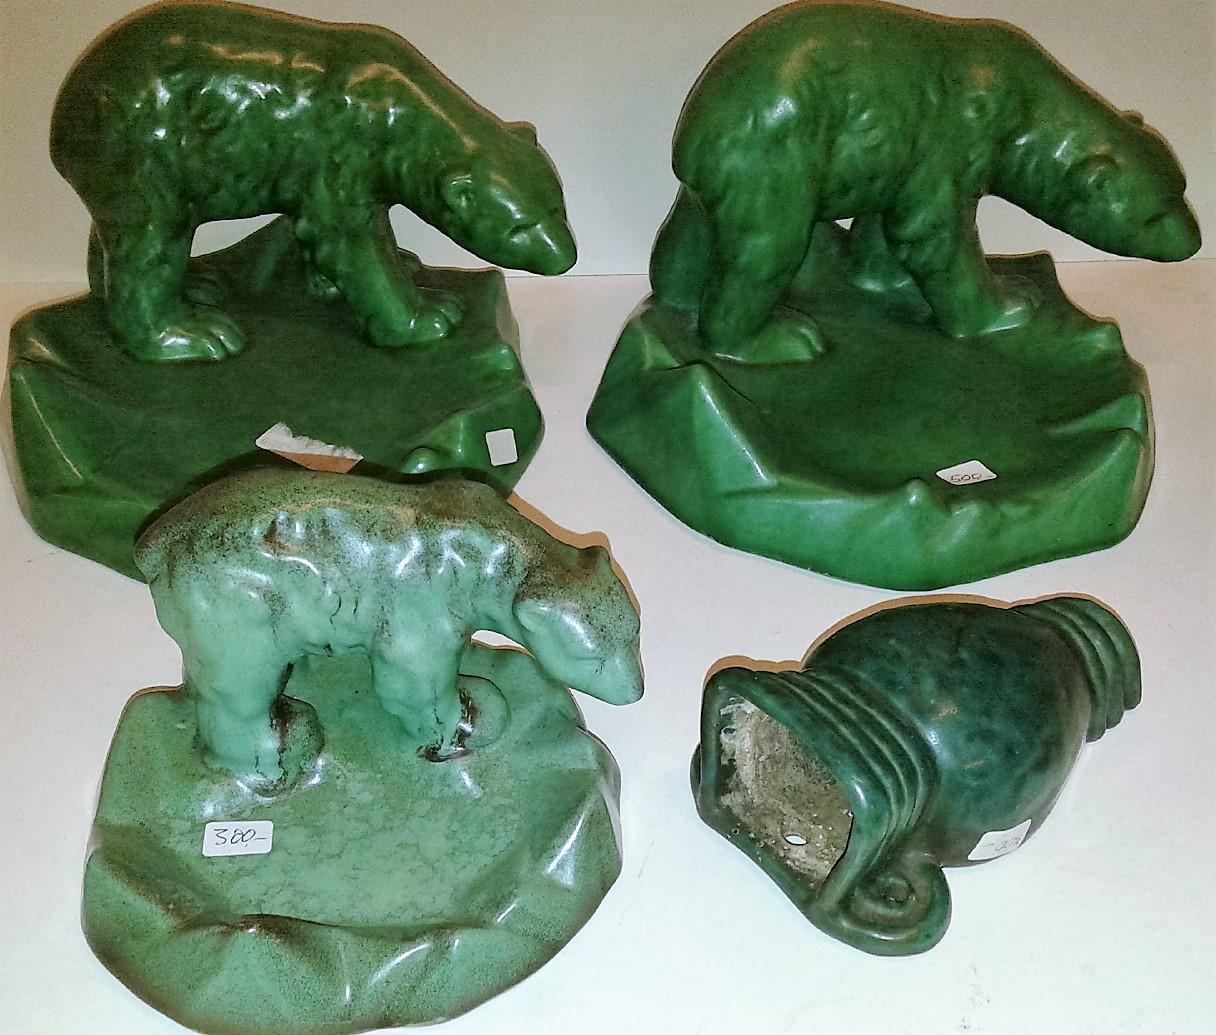 hjorth keramik skål